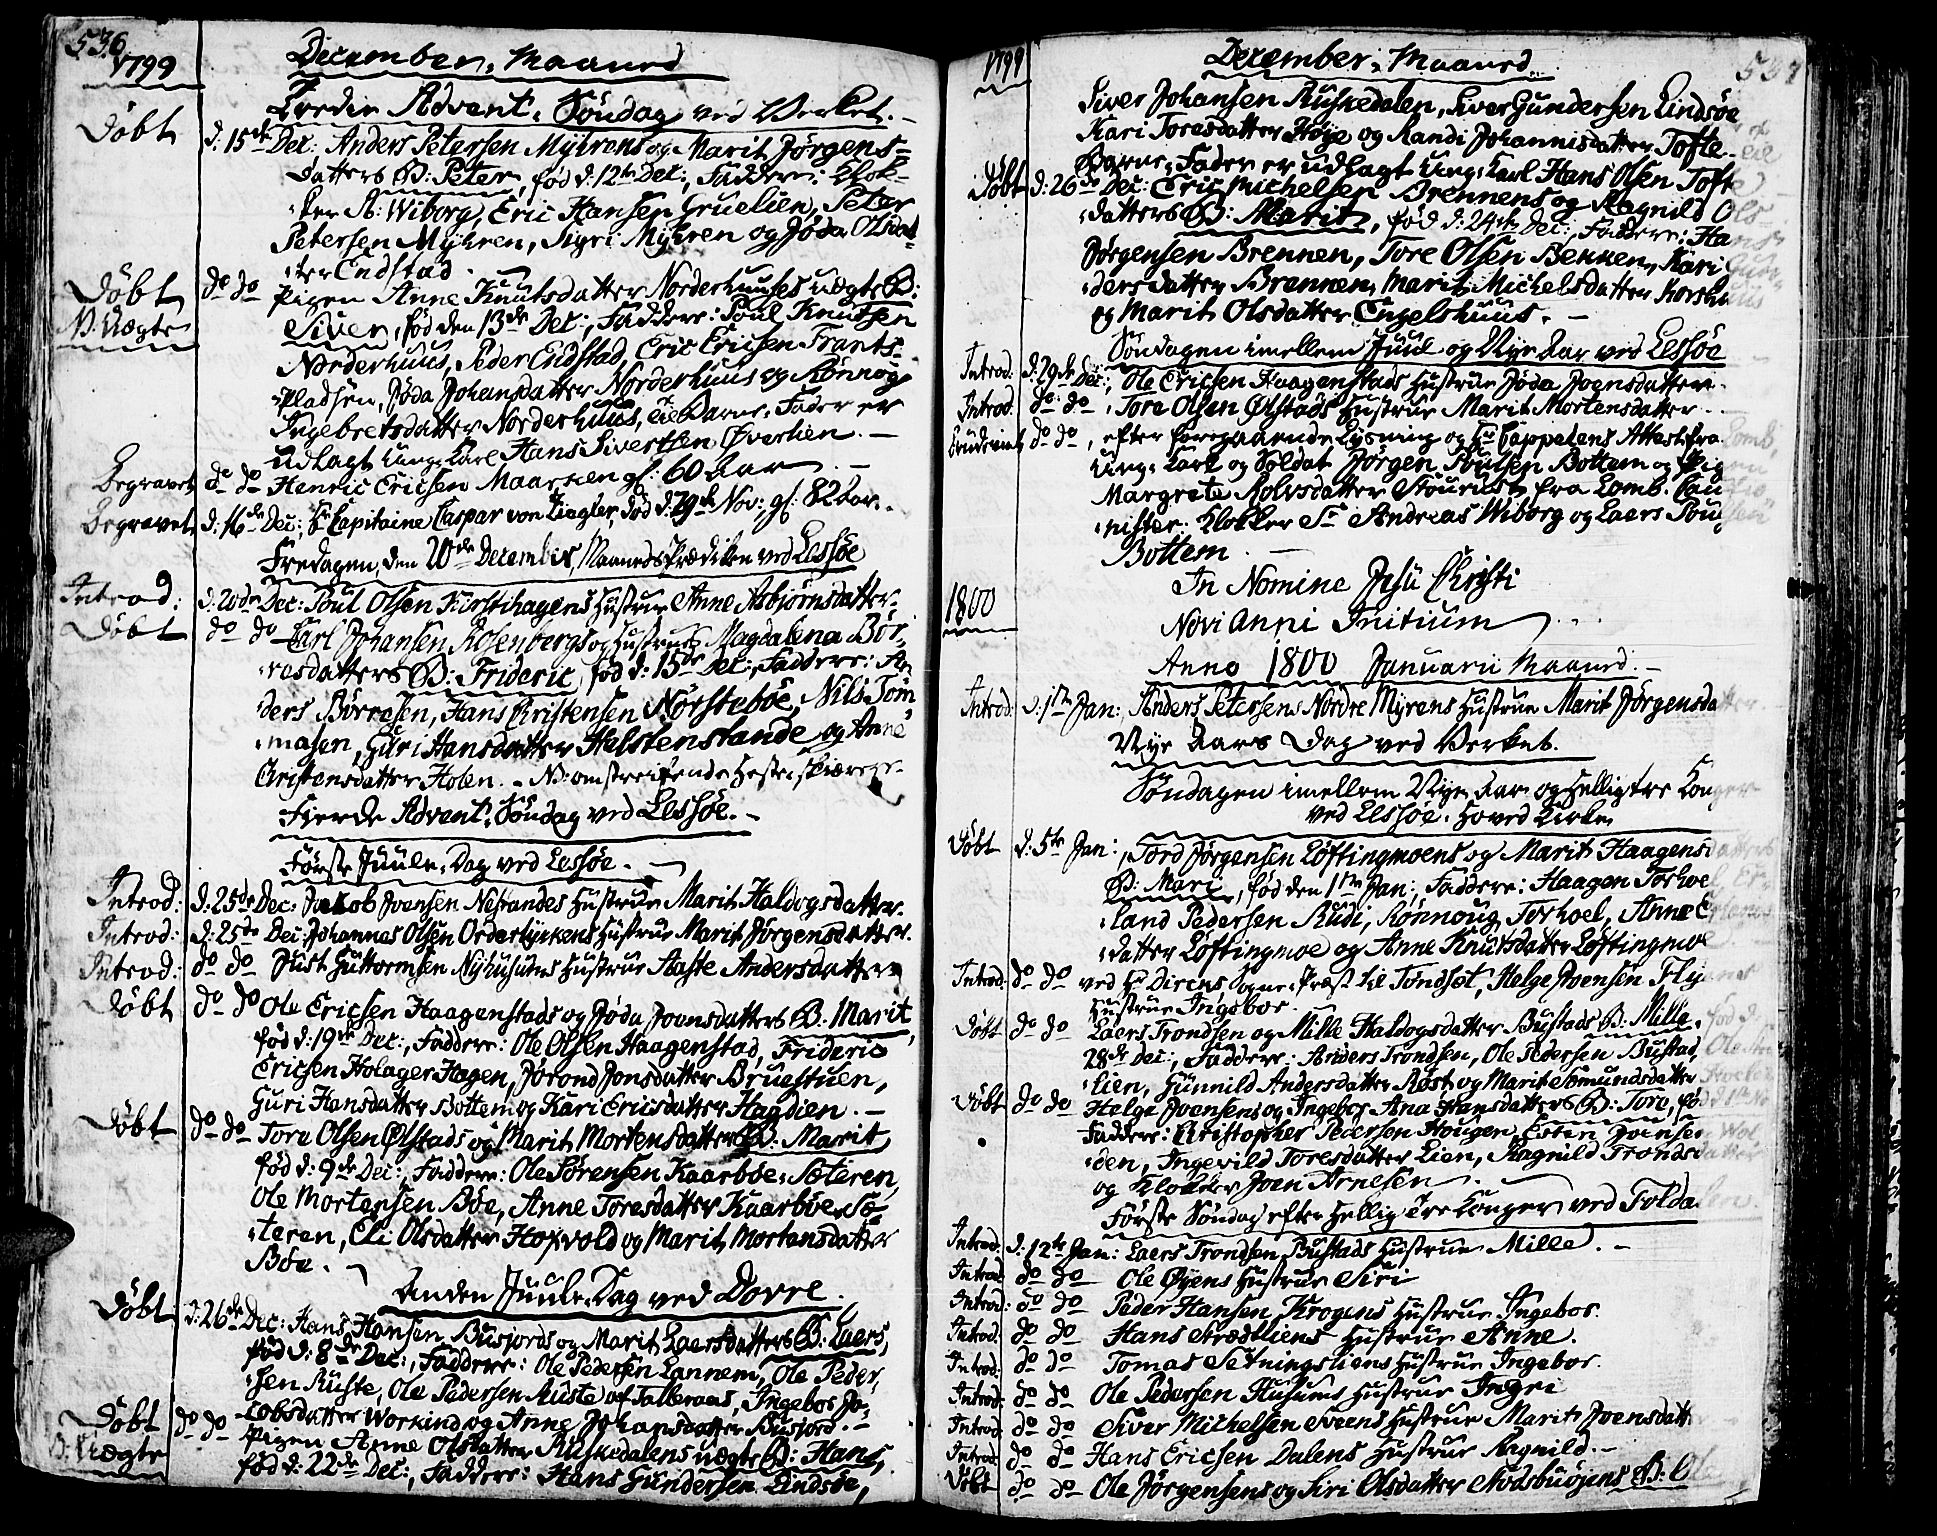 SAH, Lesja prestekontor, Ministerialbok nr. 3, 1777-1819, s. 536-537